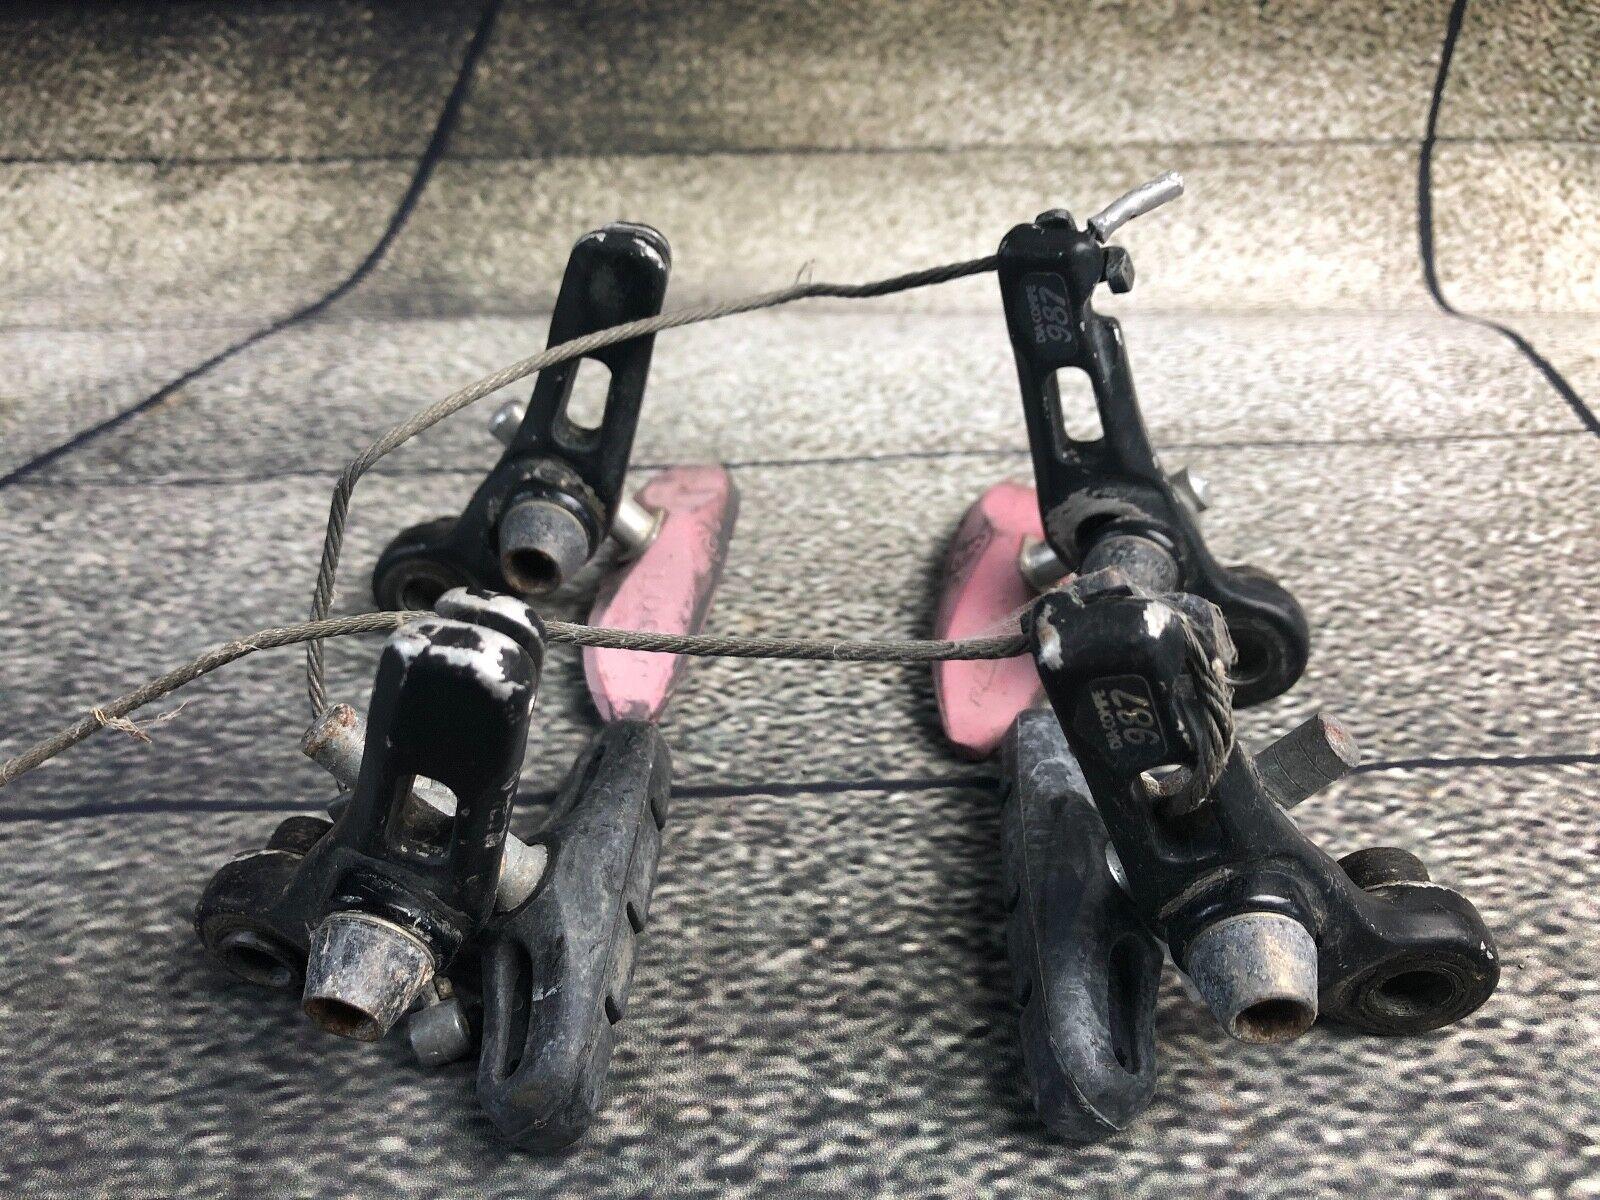 MTN Bike BMX Bicycle Brake Set DiaCompe 987 T Cantilever Brakes